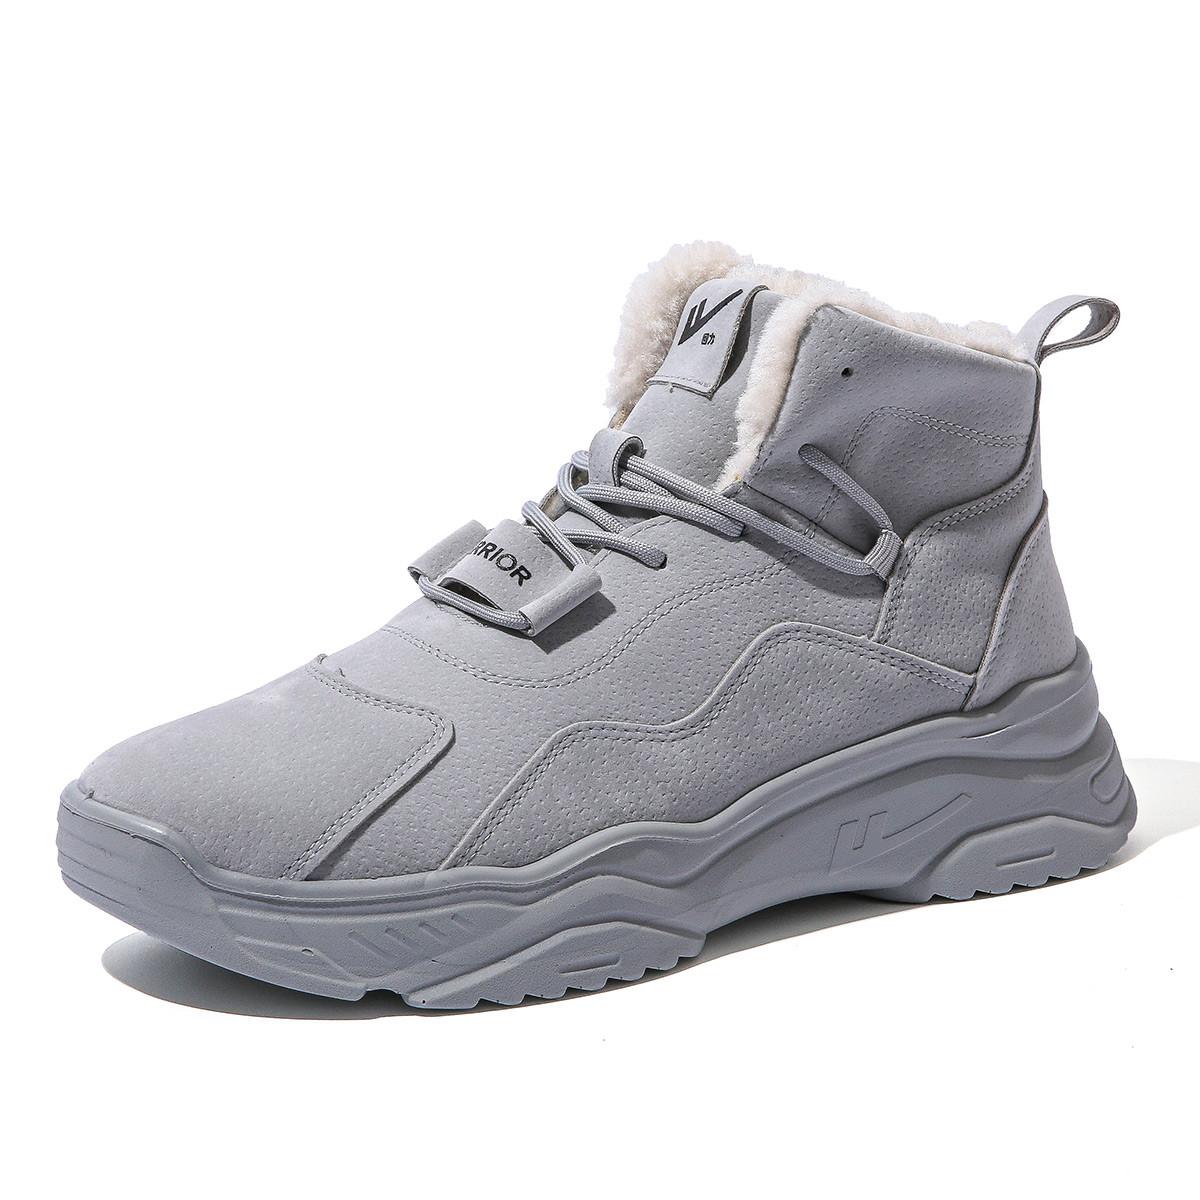 WARRIOR 回力 女子休闲马丁靴 HLACX-2H  灰色 39